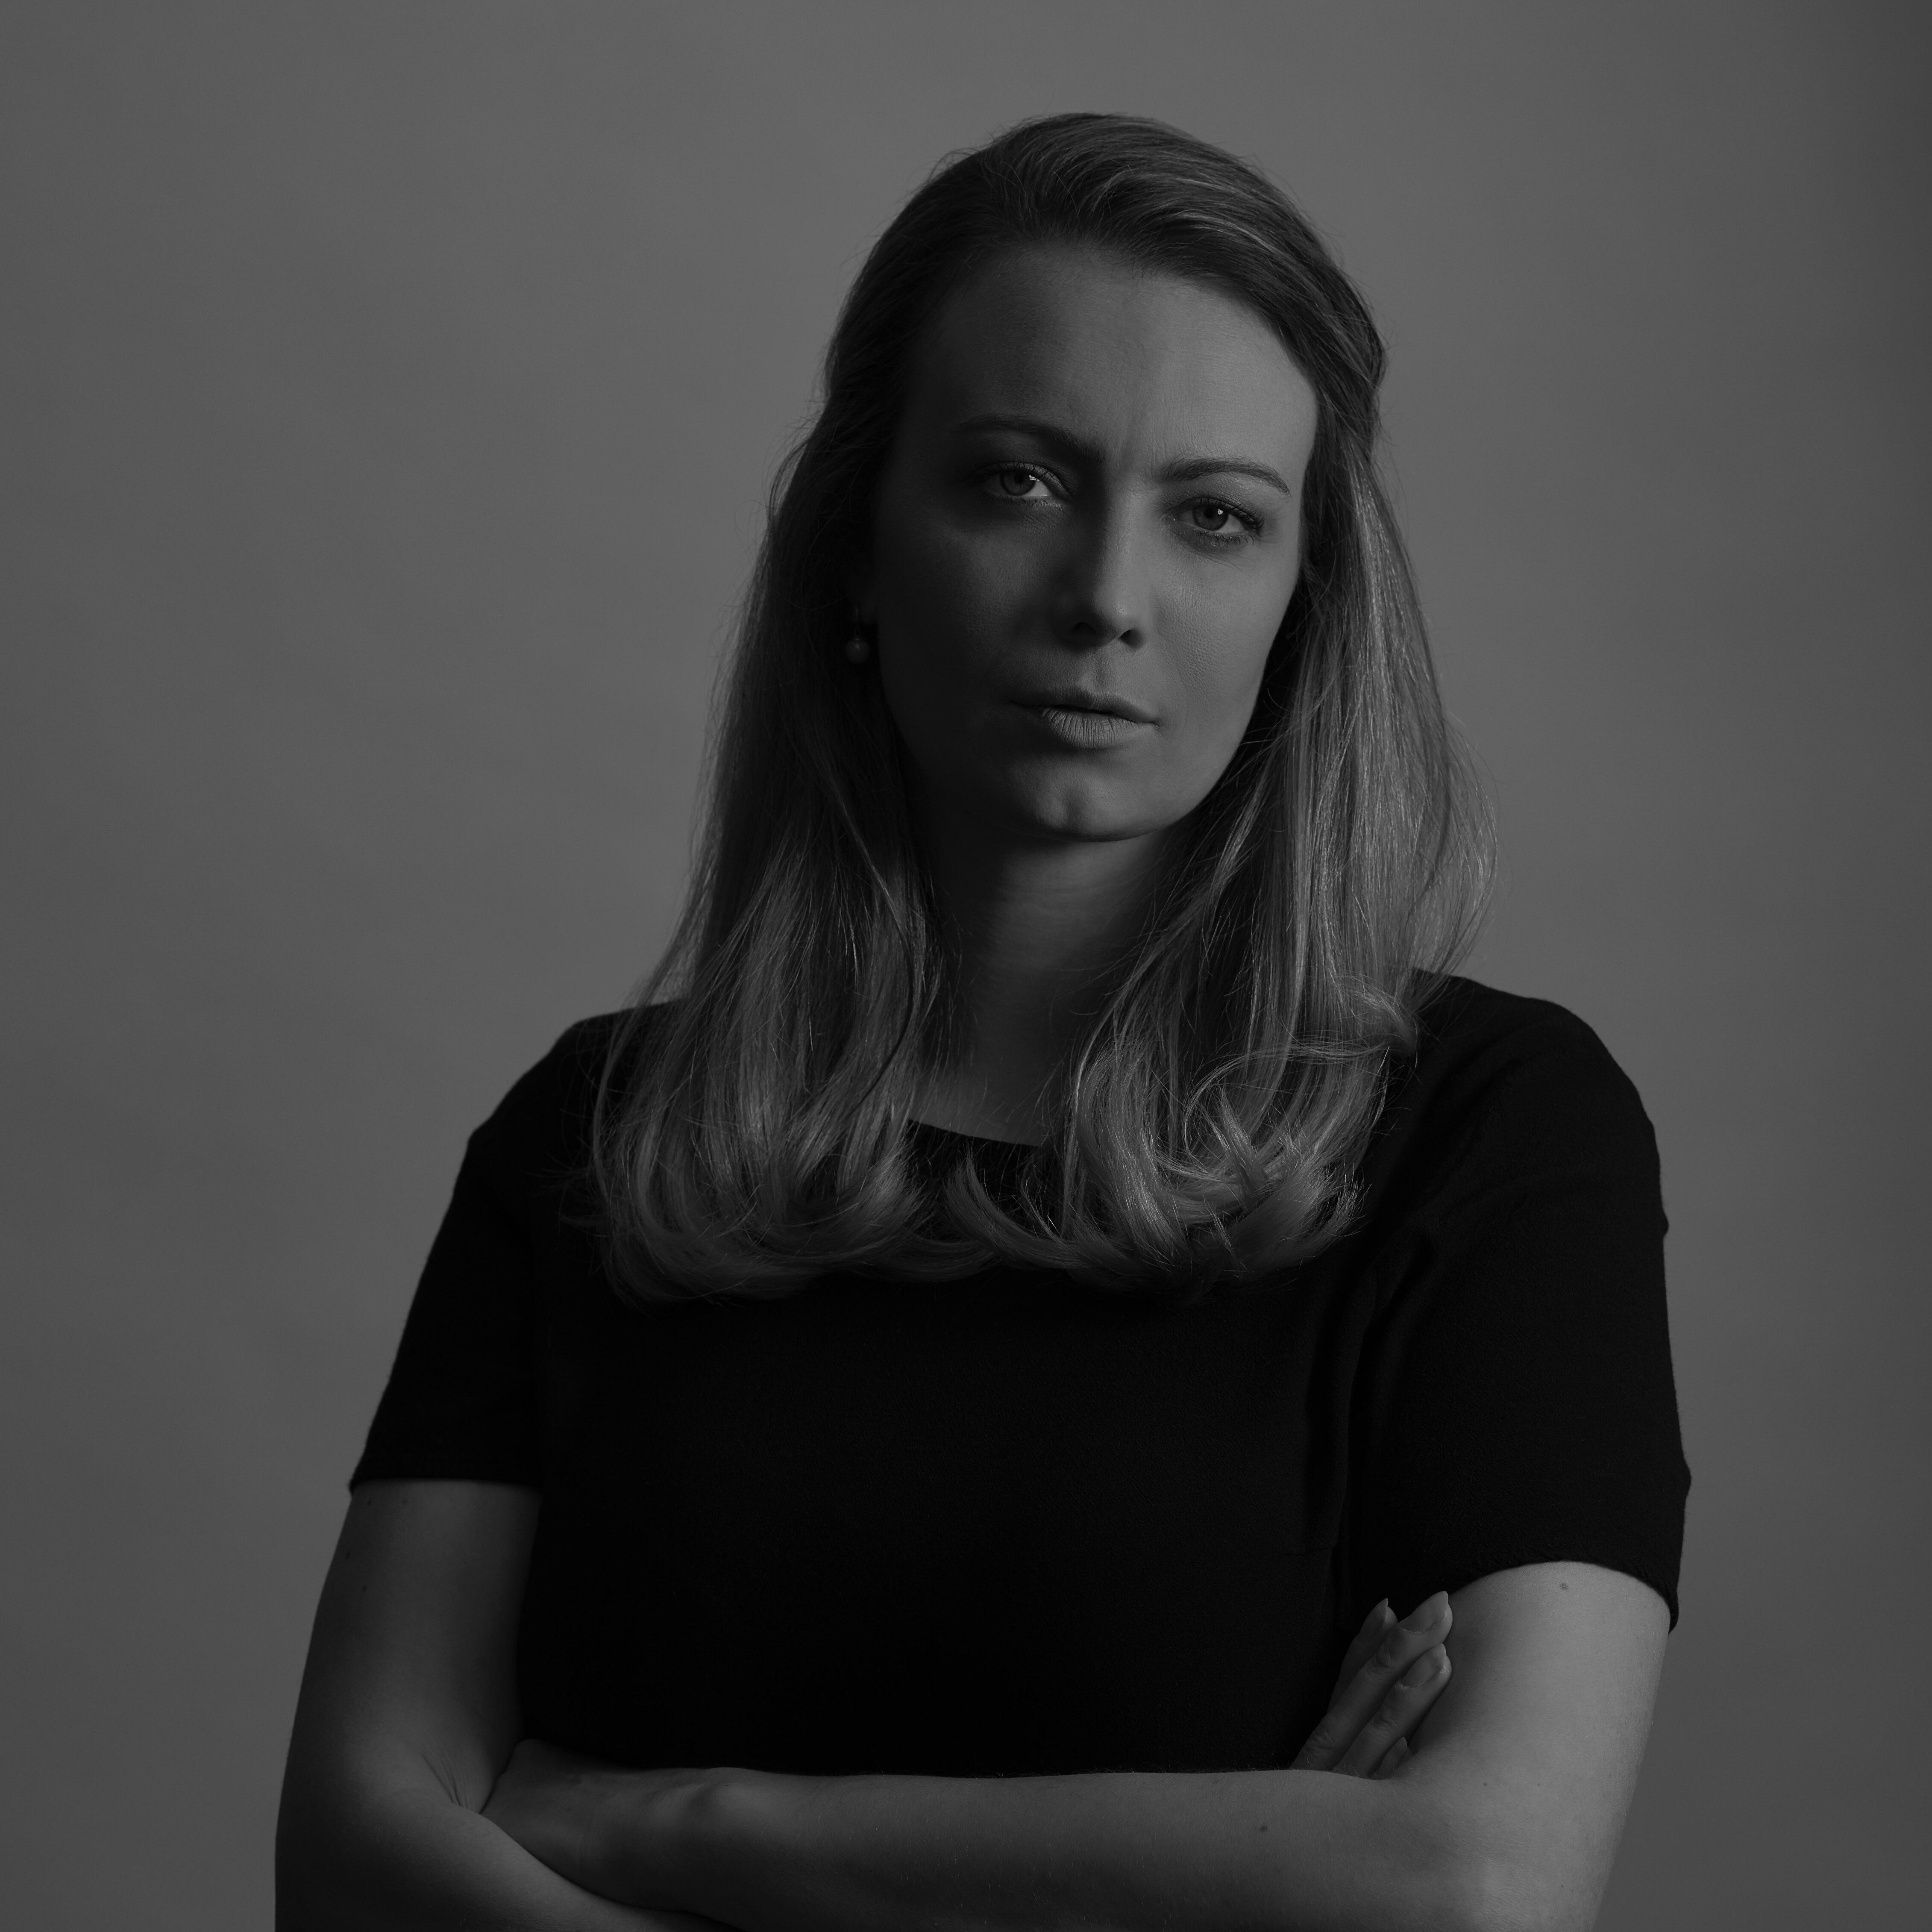 Justyna Rulewicz